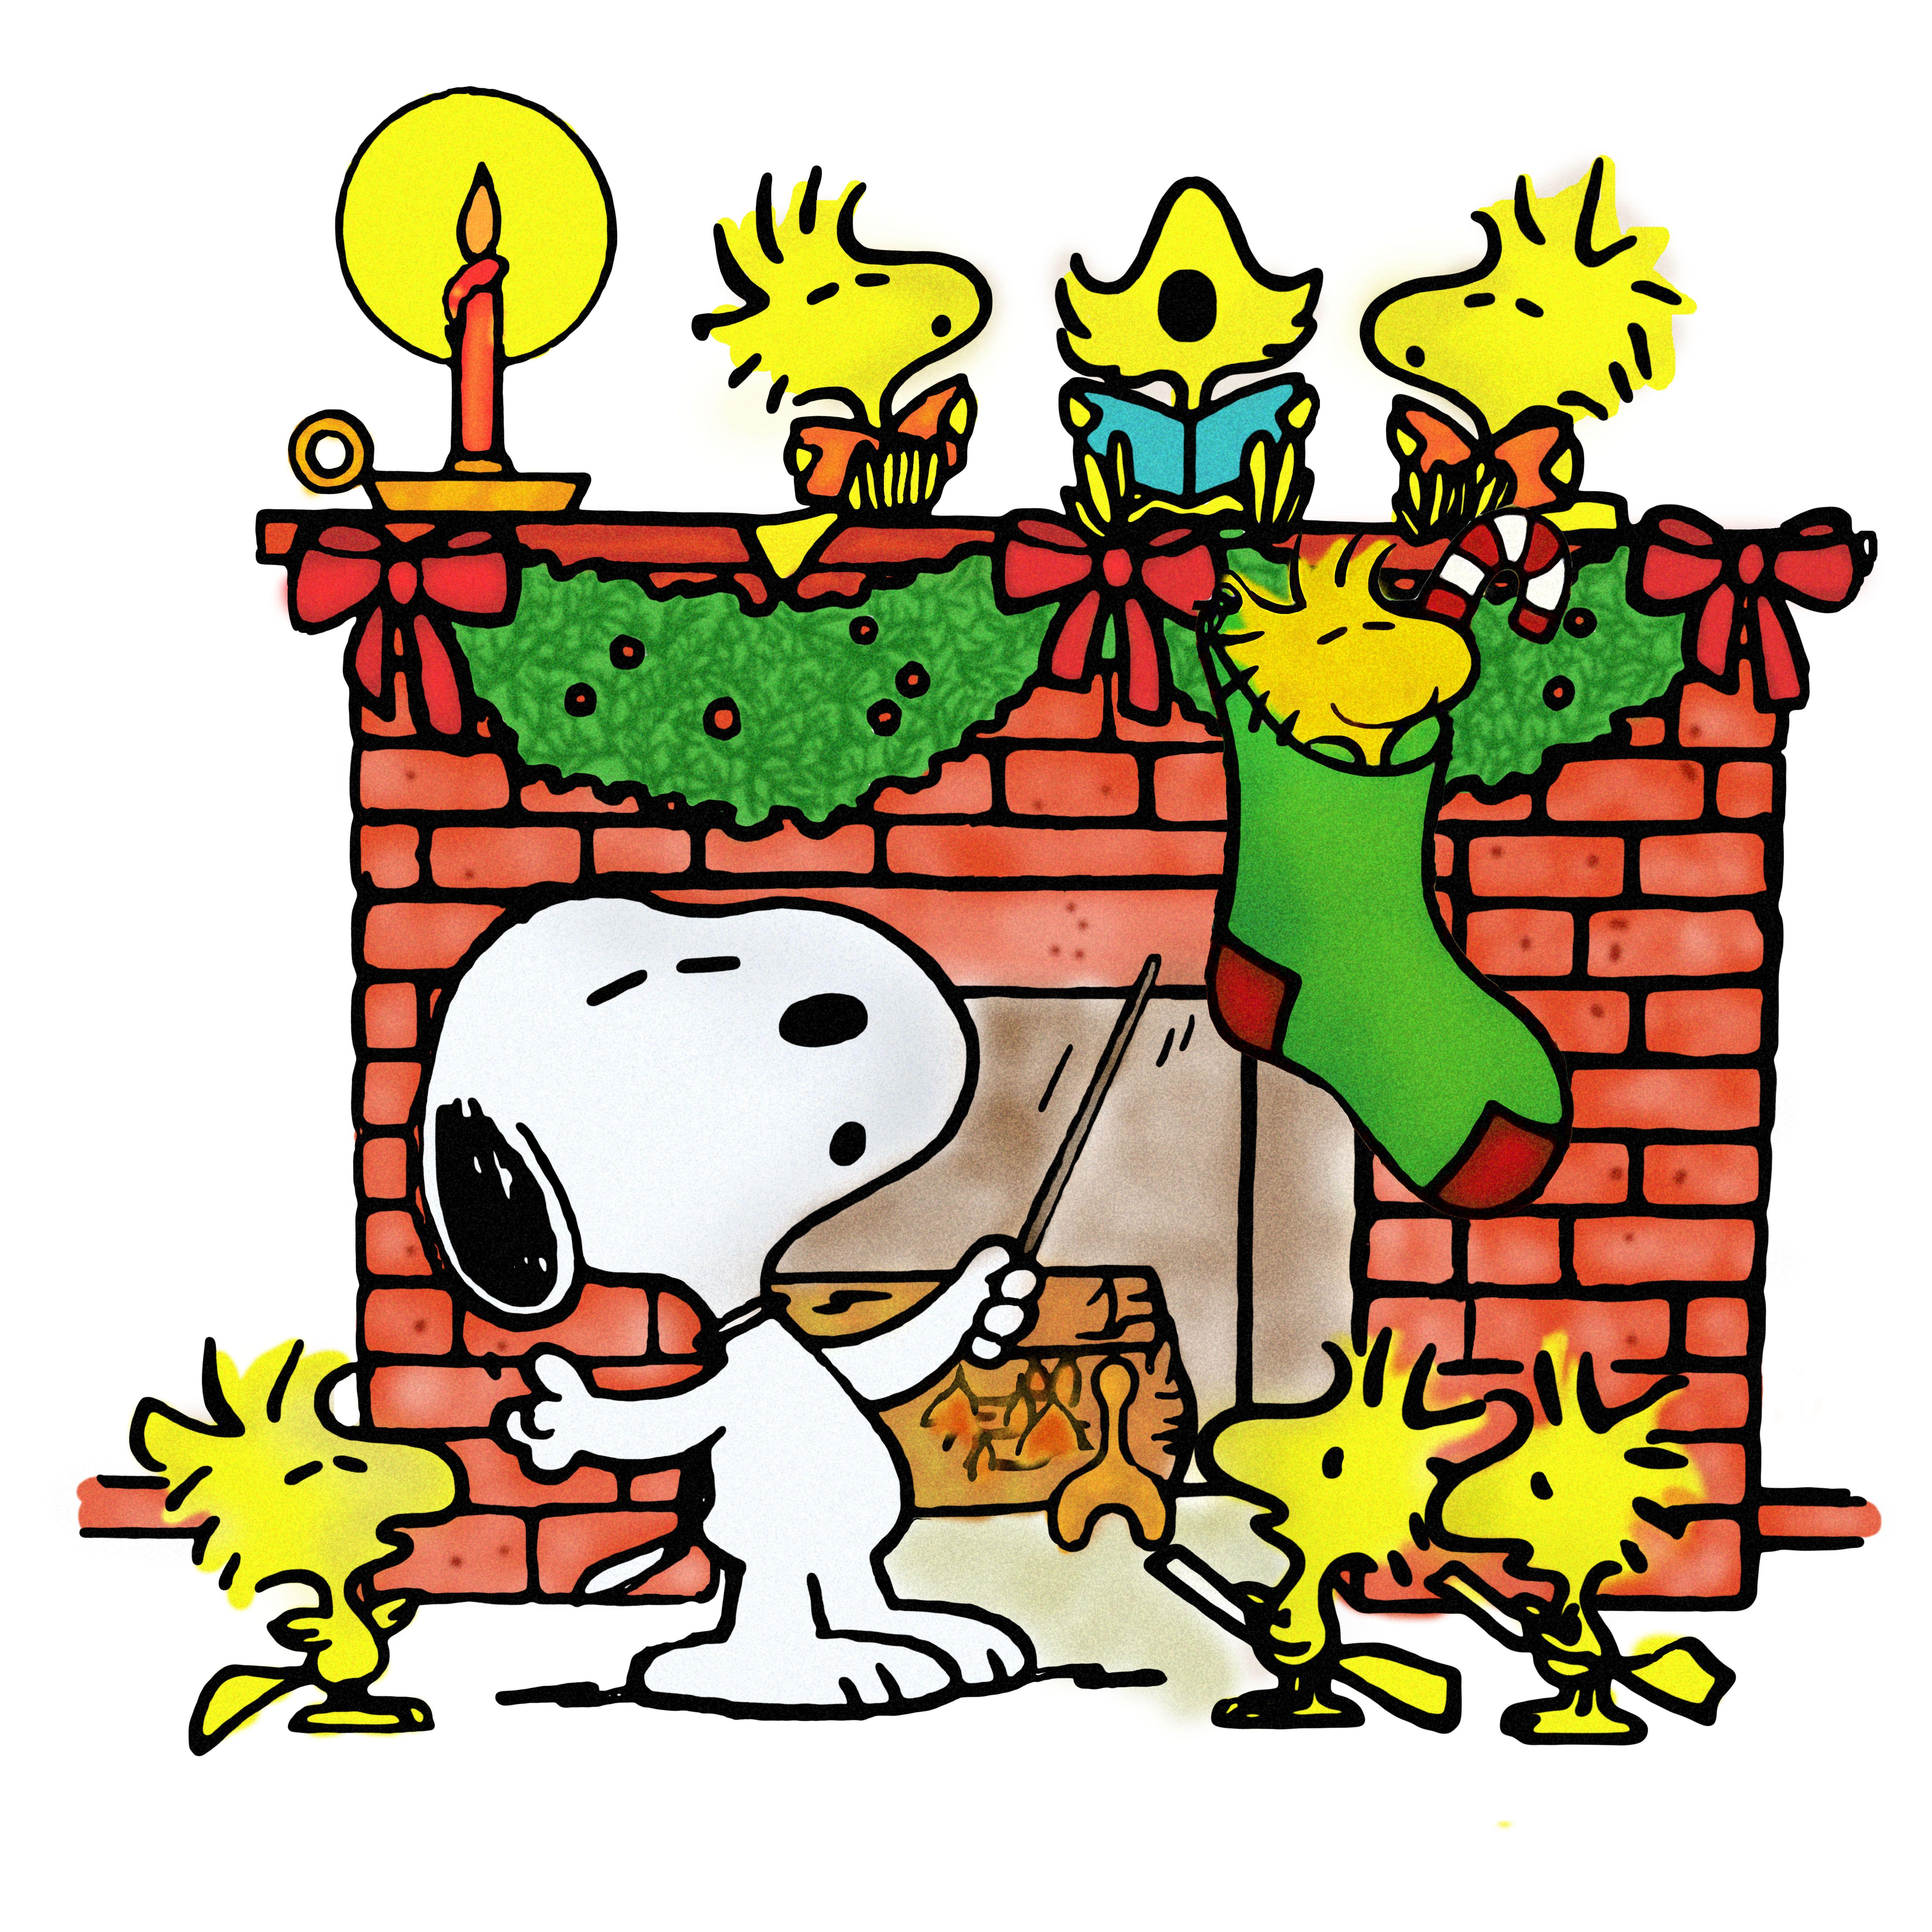 Caroling clipart snoopy christmas. And woodstock singing carols